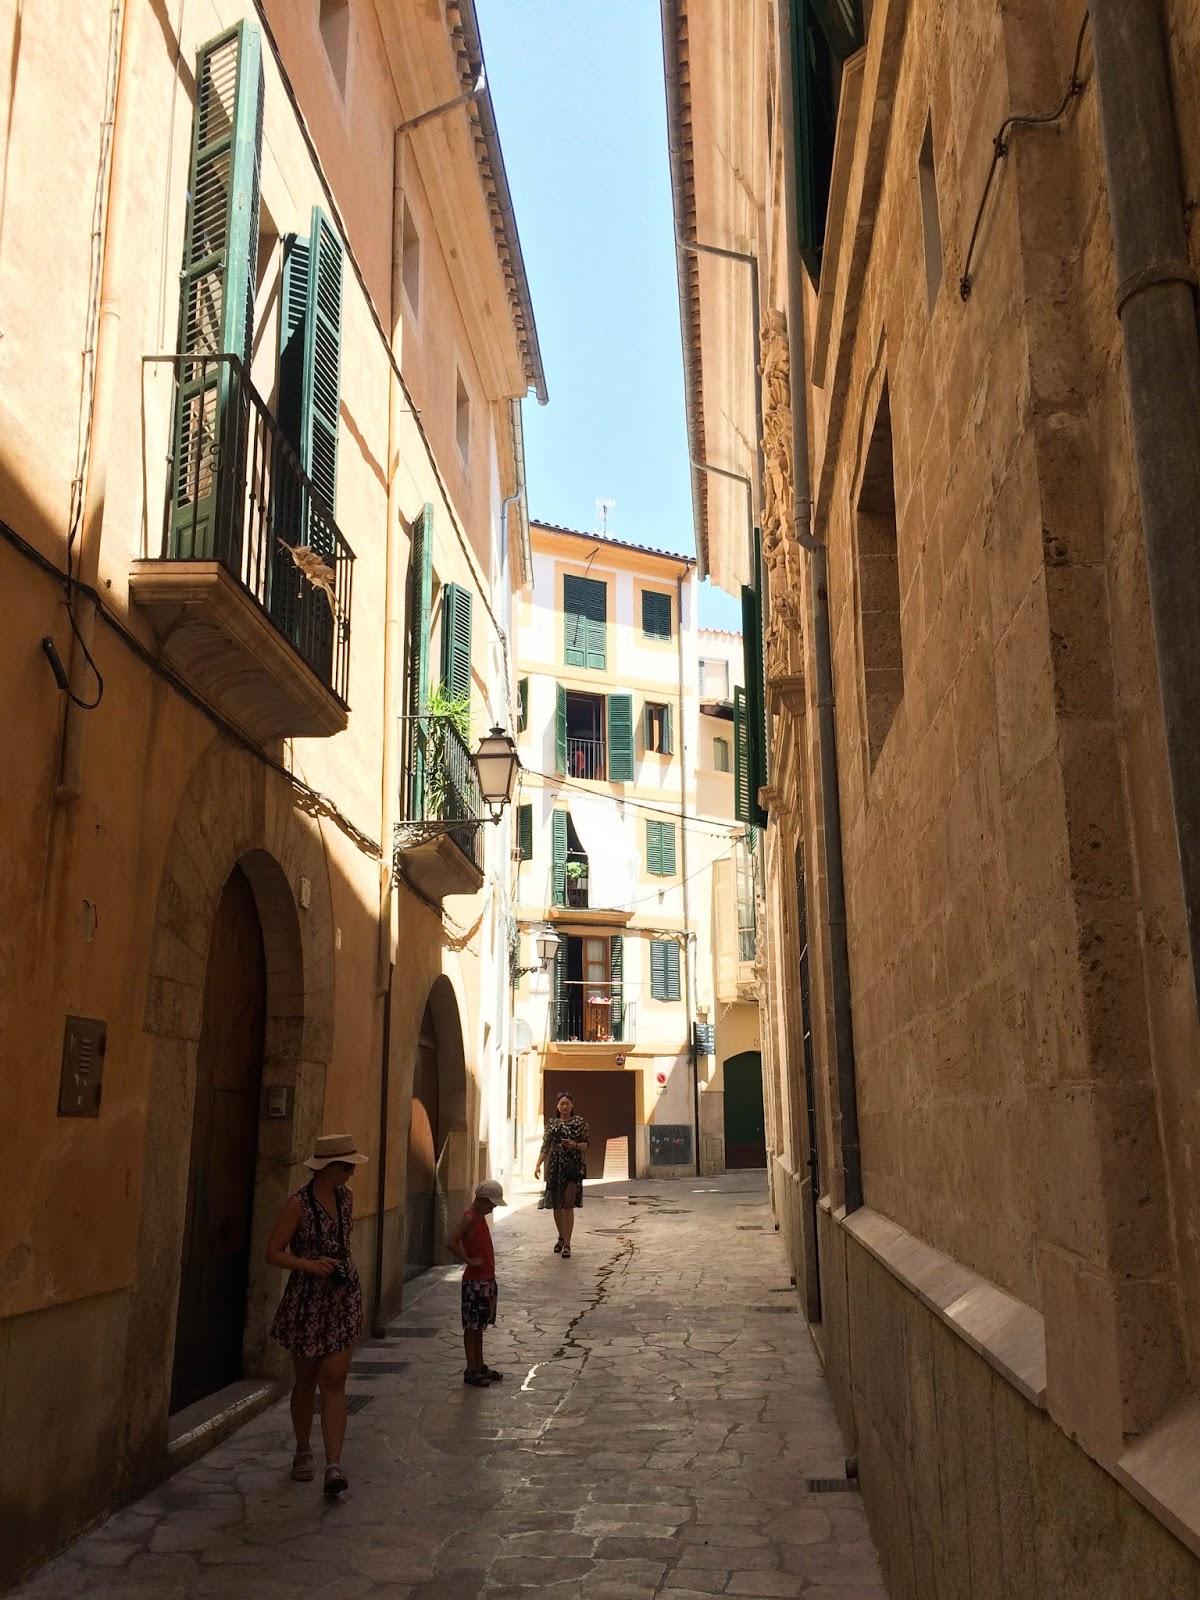 Palma de Mallorca, things to do in Palma, travel blog